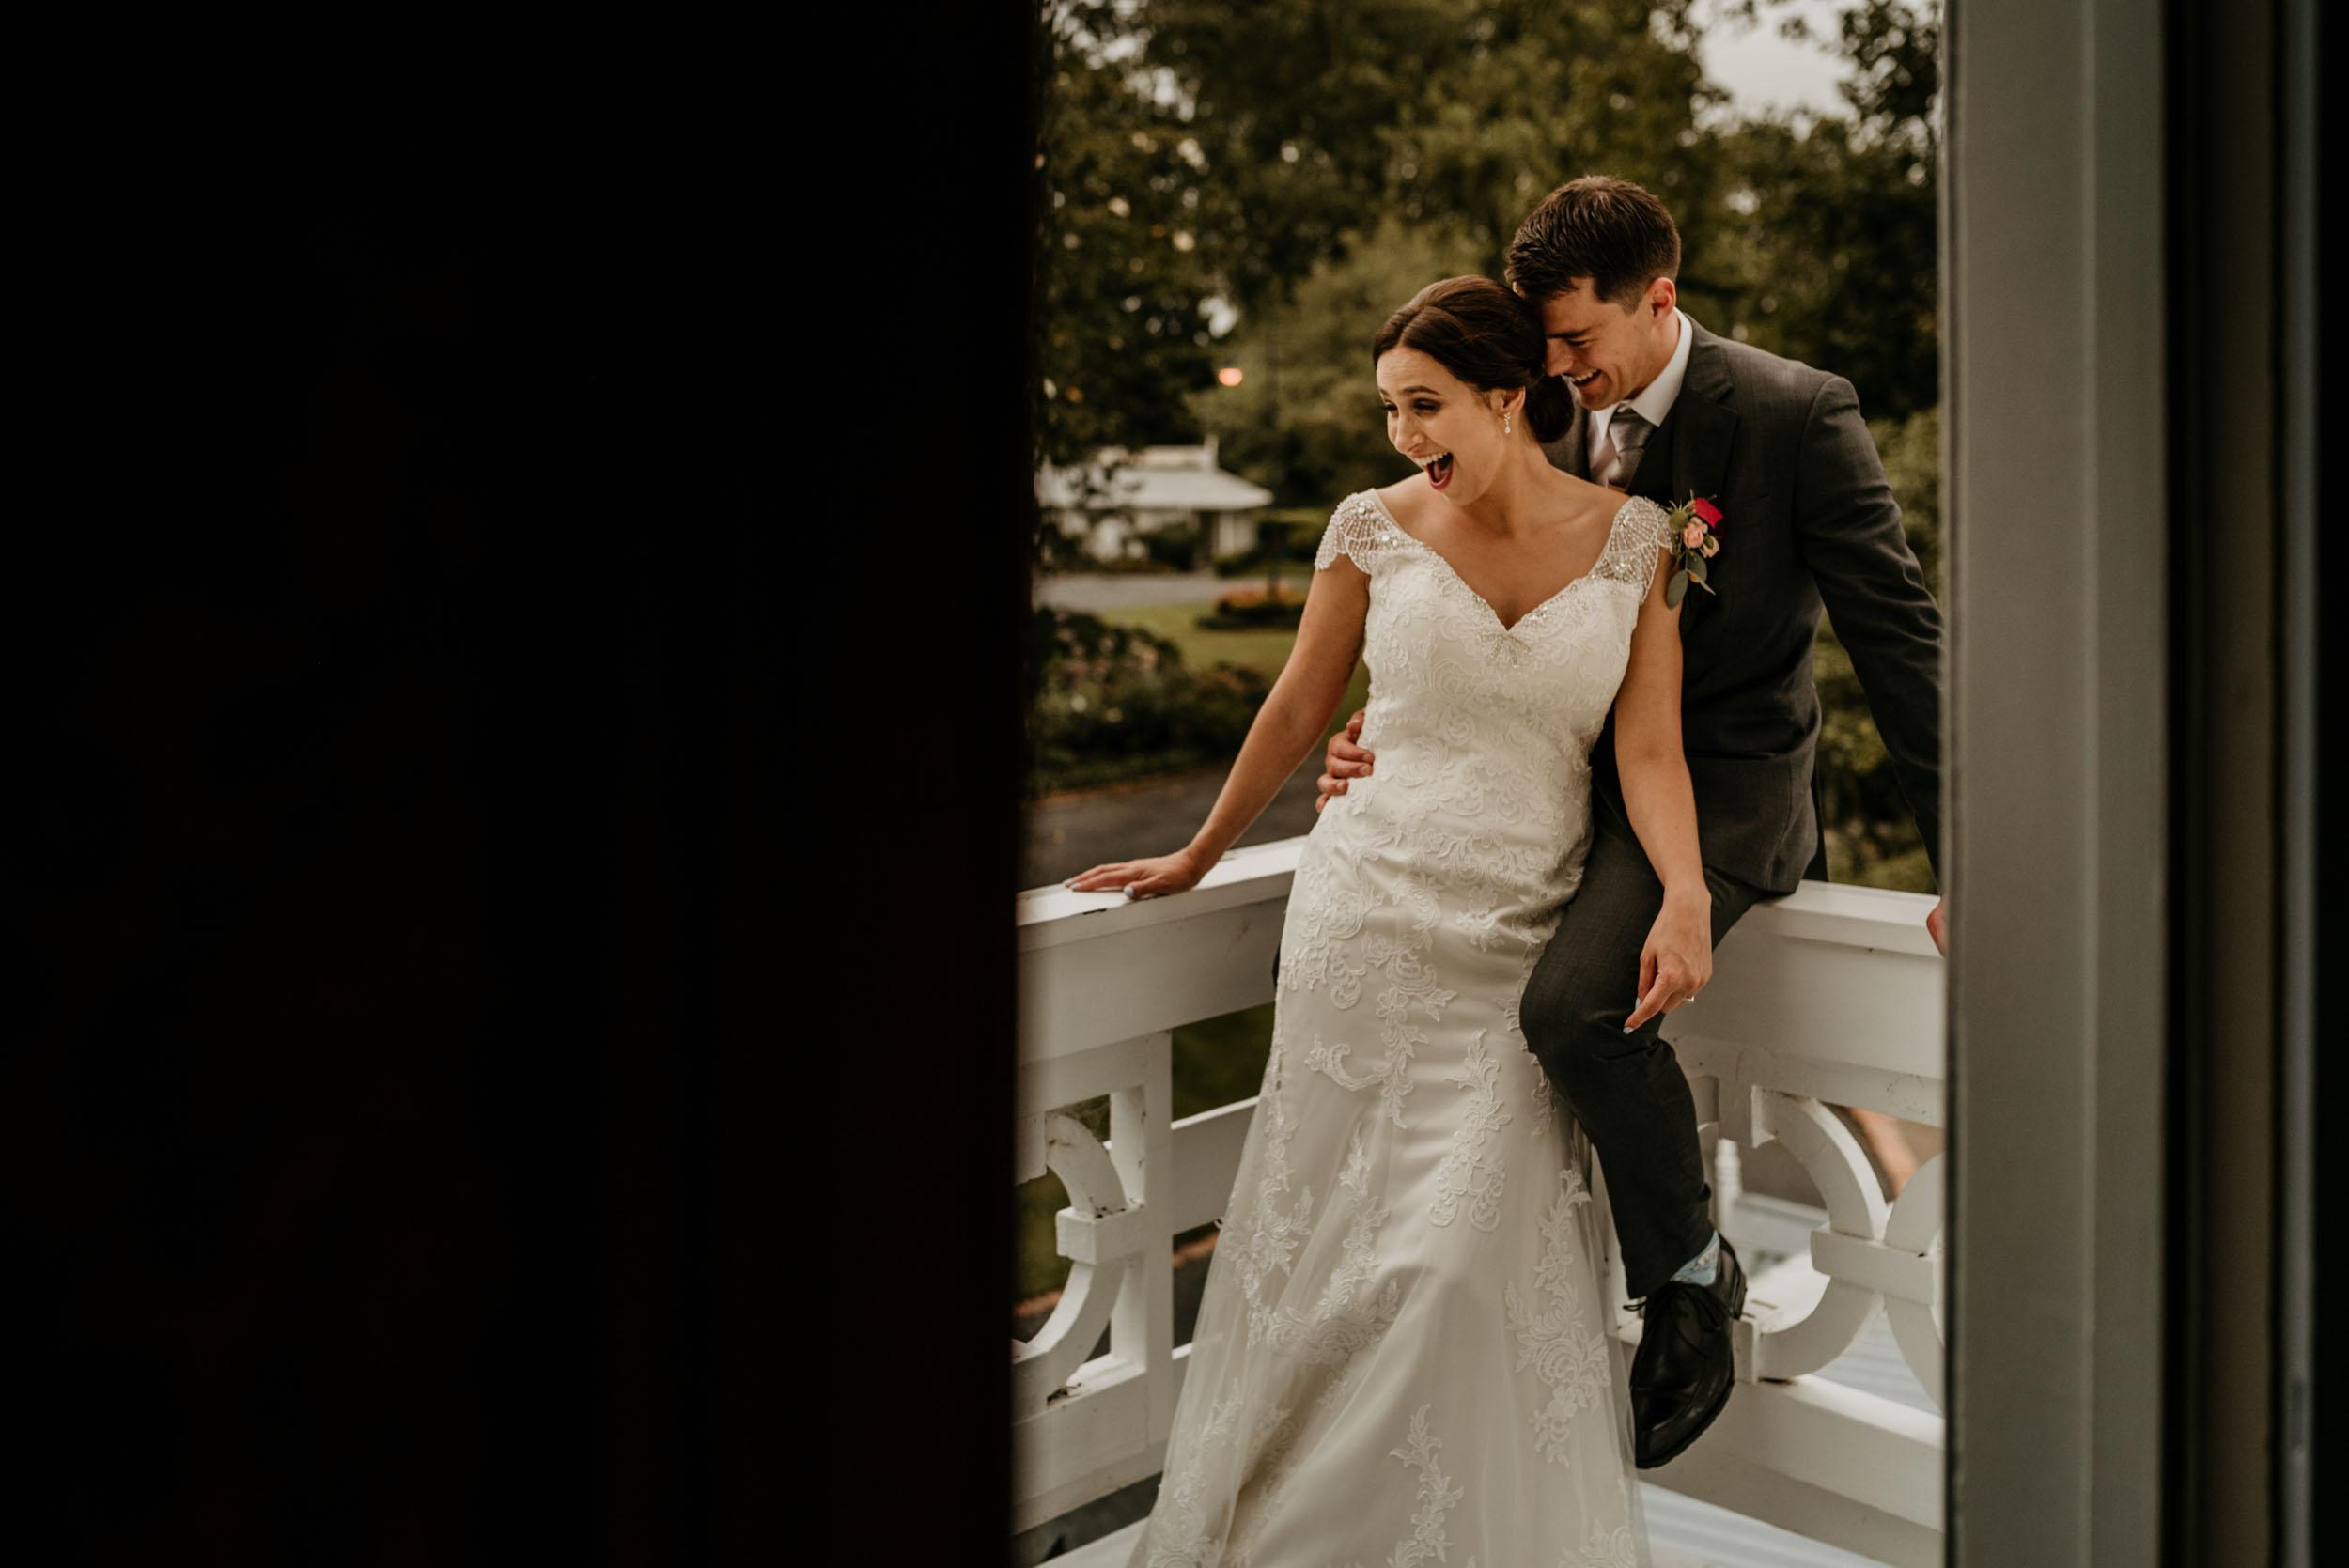 The Raw Photographer - Cairns Wedding Photographer - New Zealand Destination Photography - Travel - Australian-8.jpg